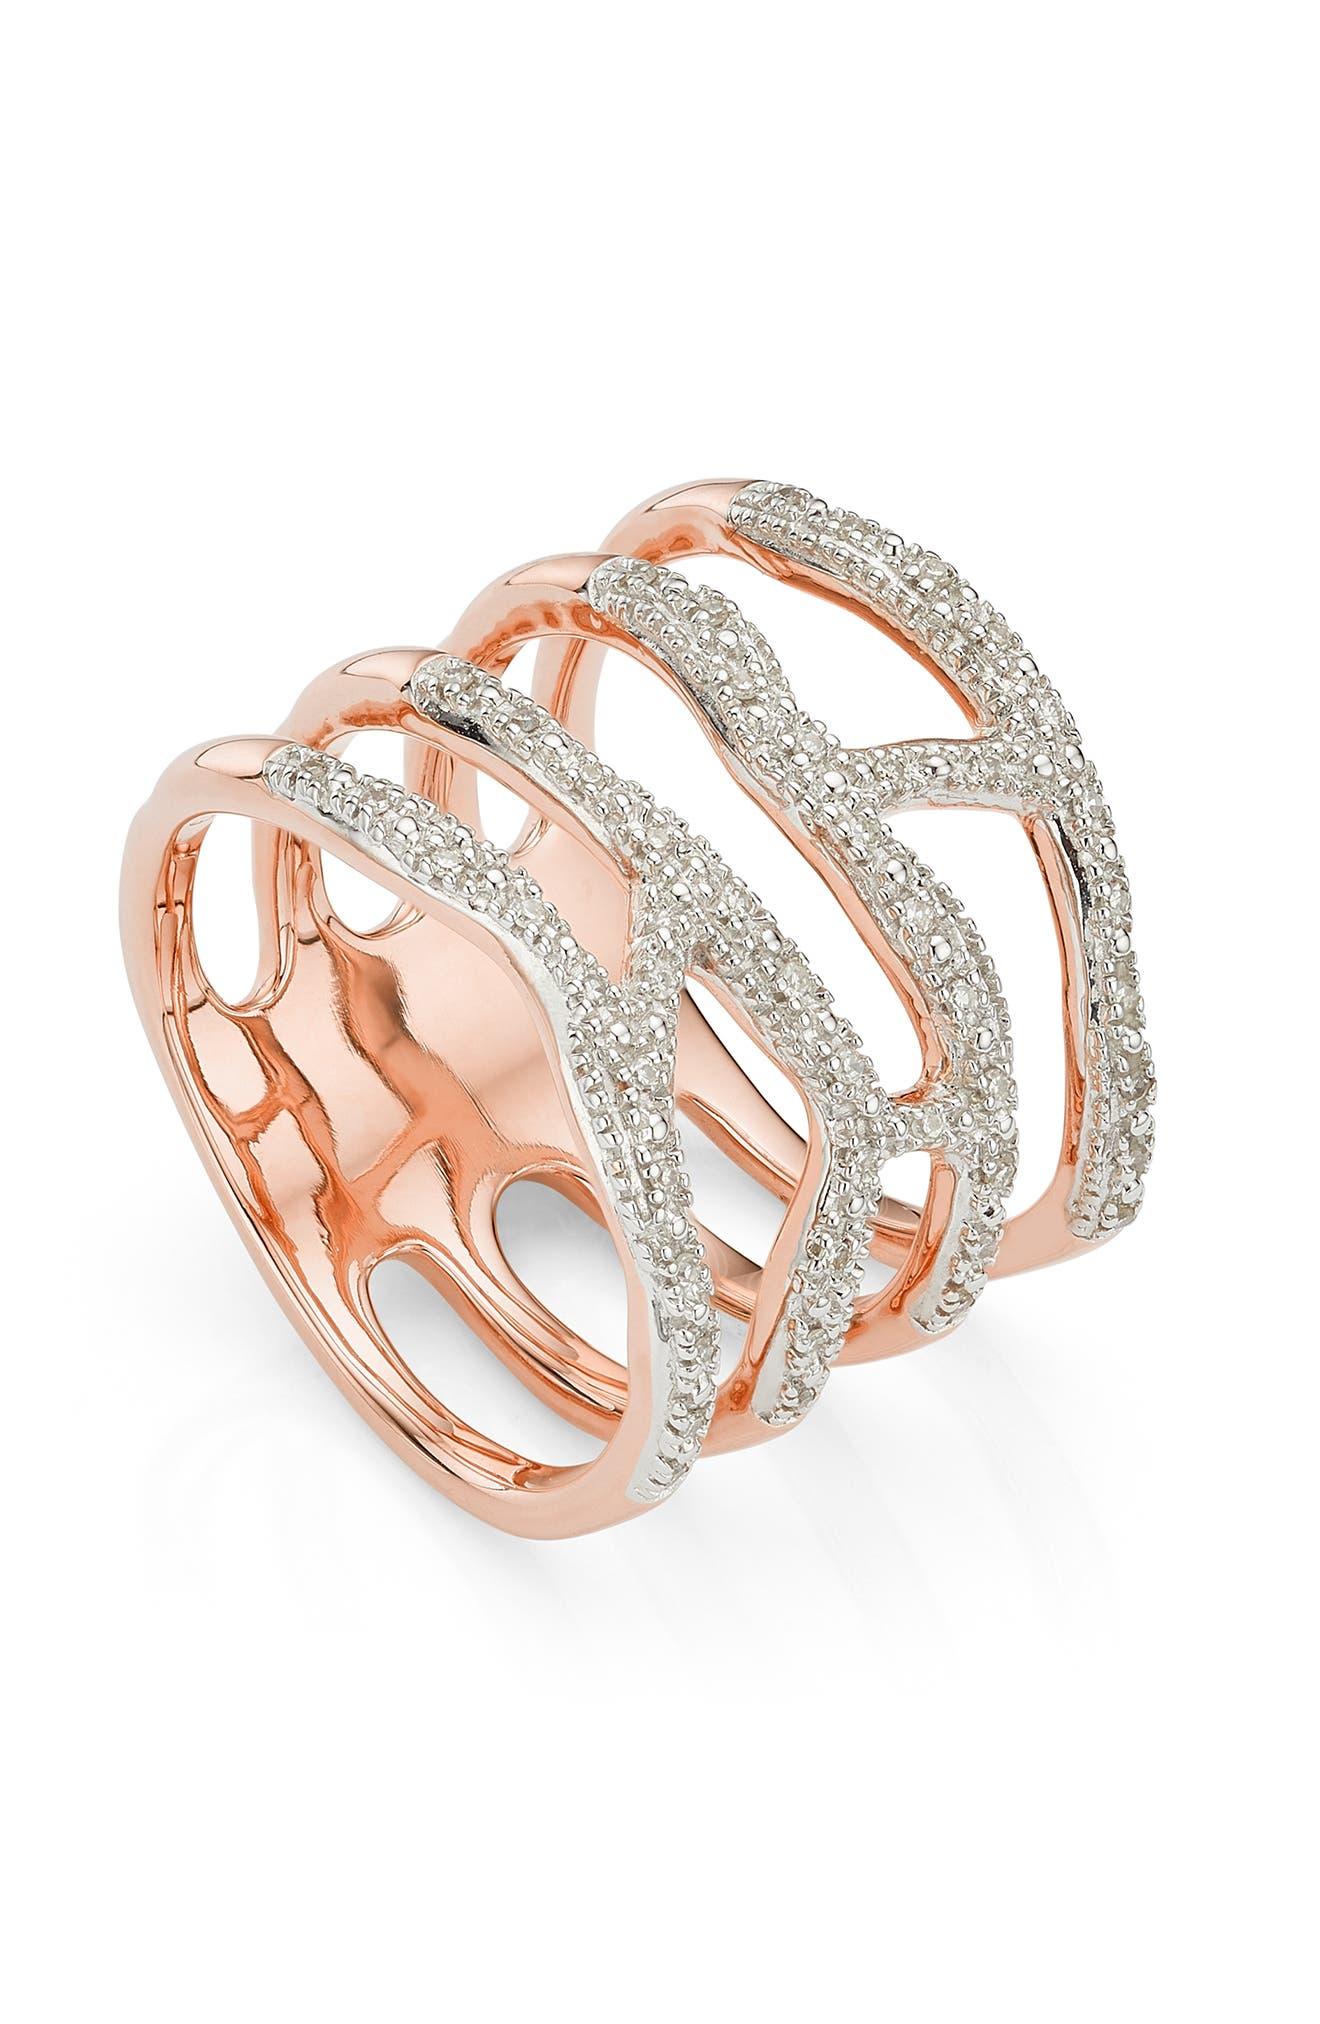 MONICA VINADER, Riva Waterfall Diamond Cocktail Ring, Alternate thumbnail 2, color, ROSE GOLD/ DIAMOND